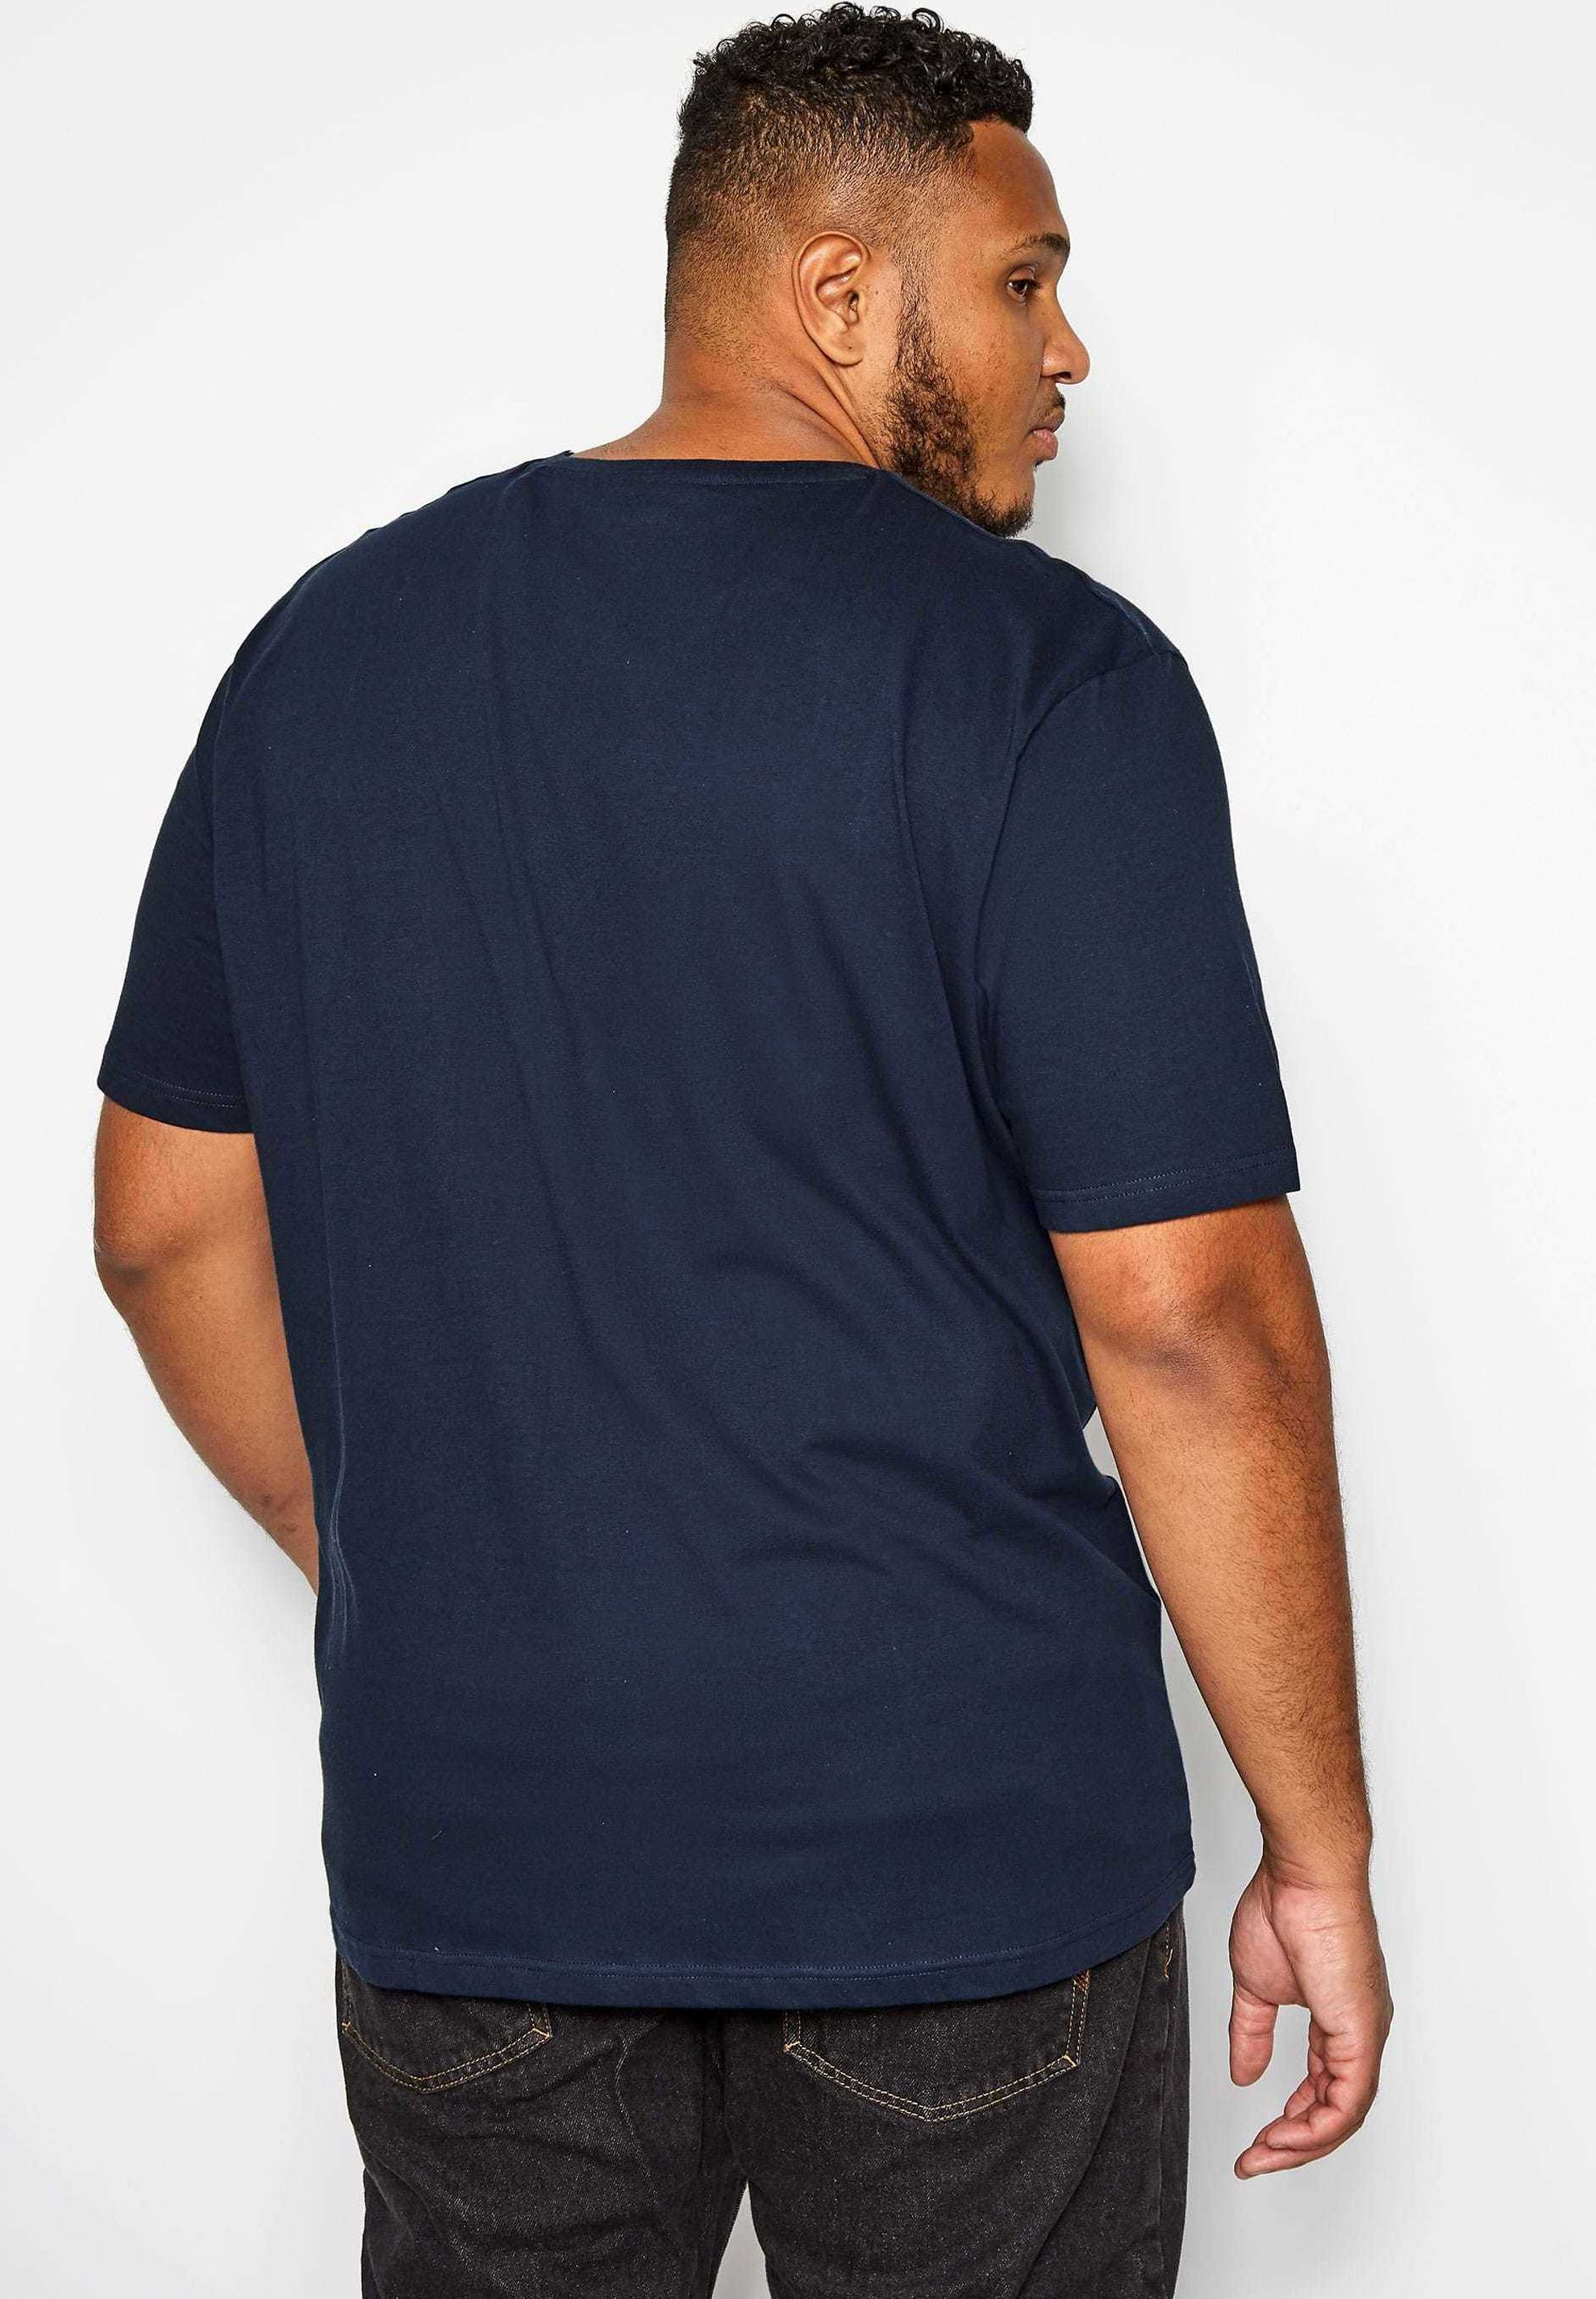 BadRhino Print T-shirt - blue e2I1a